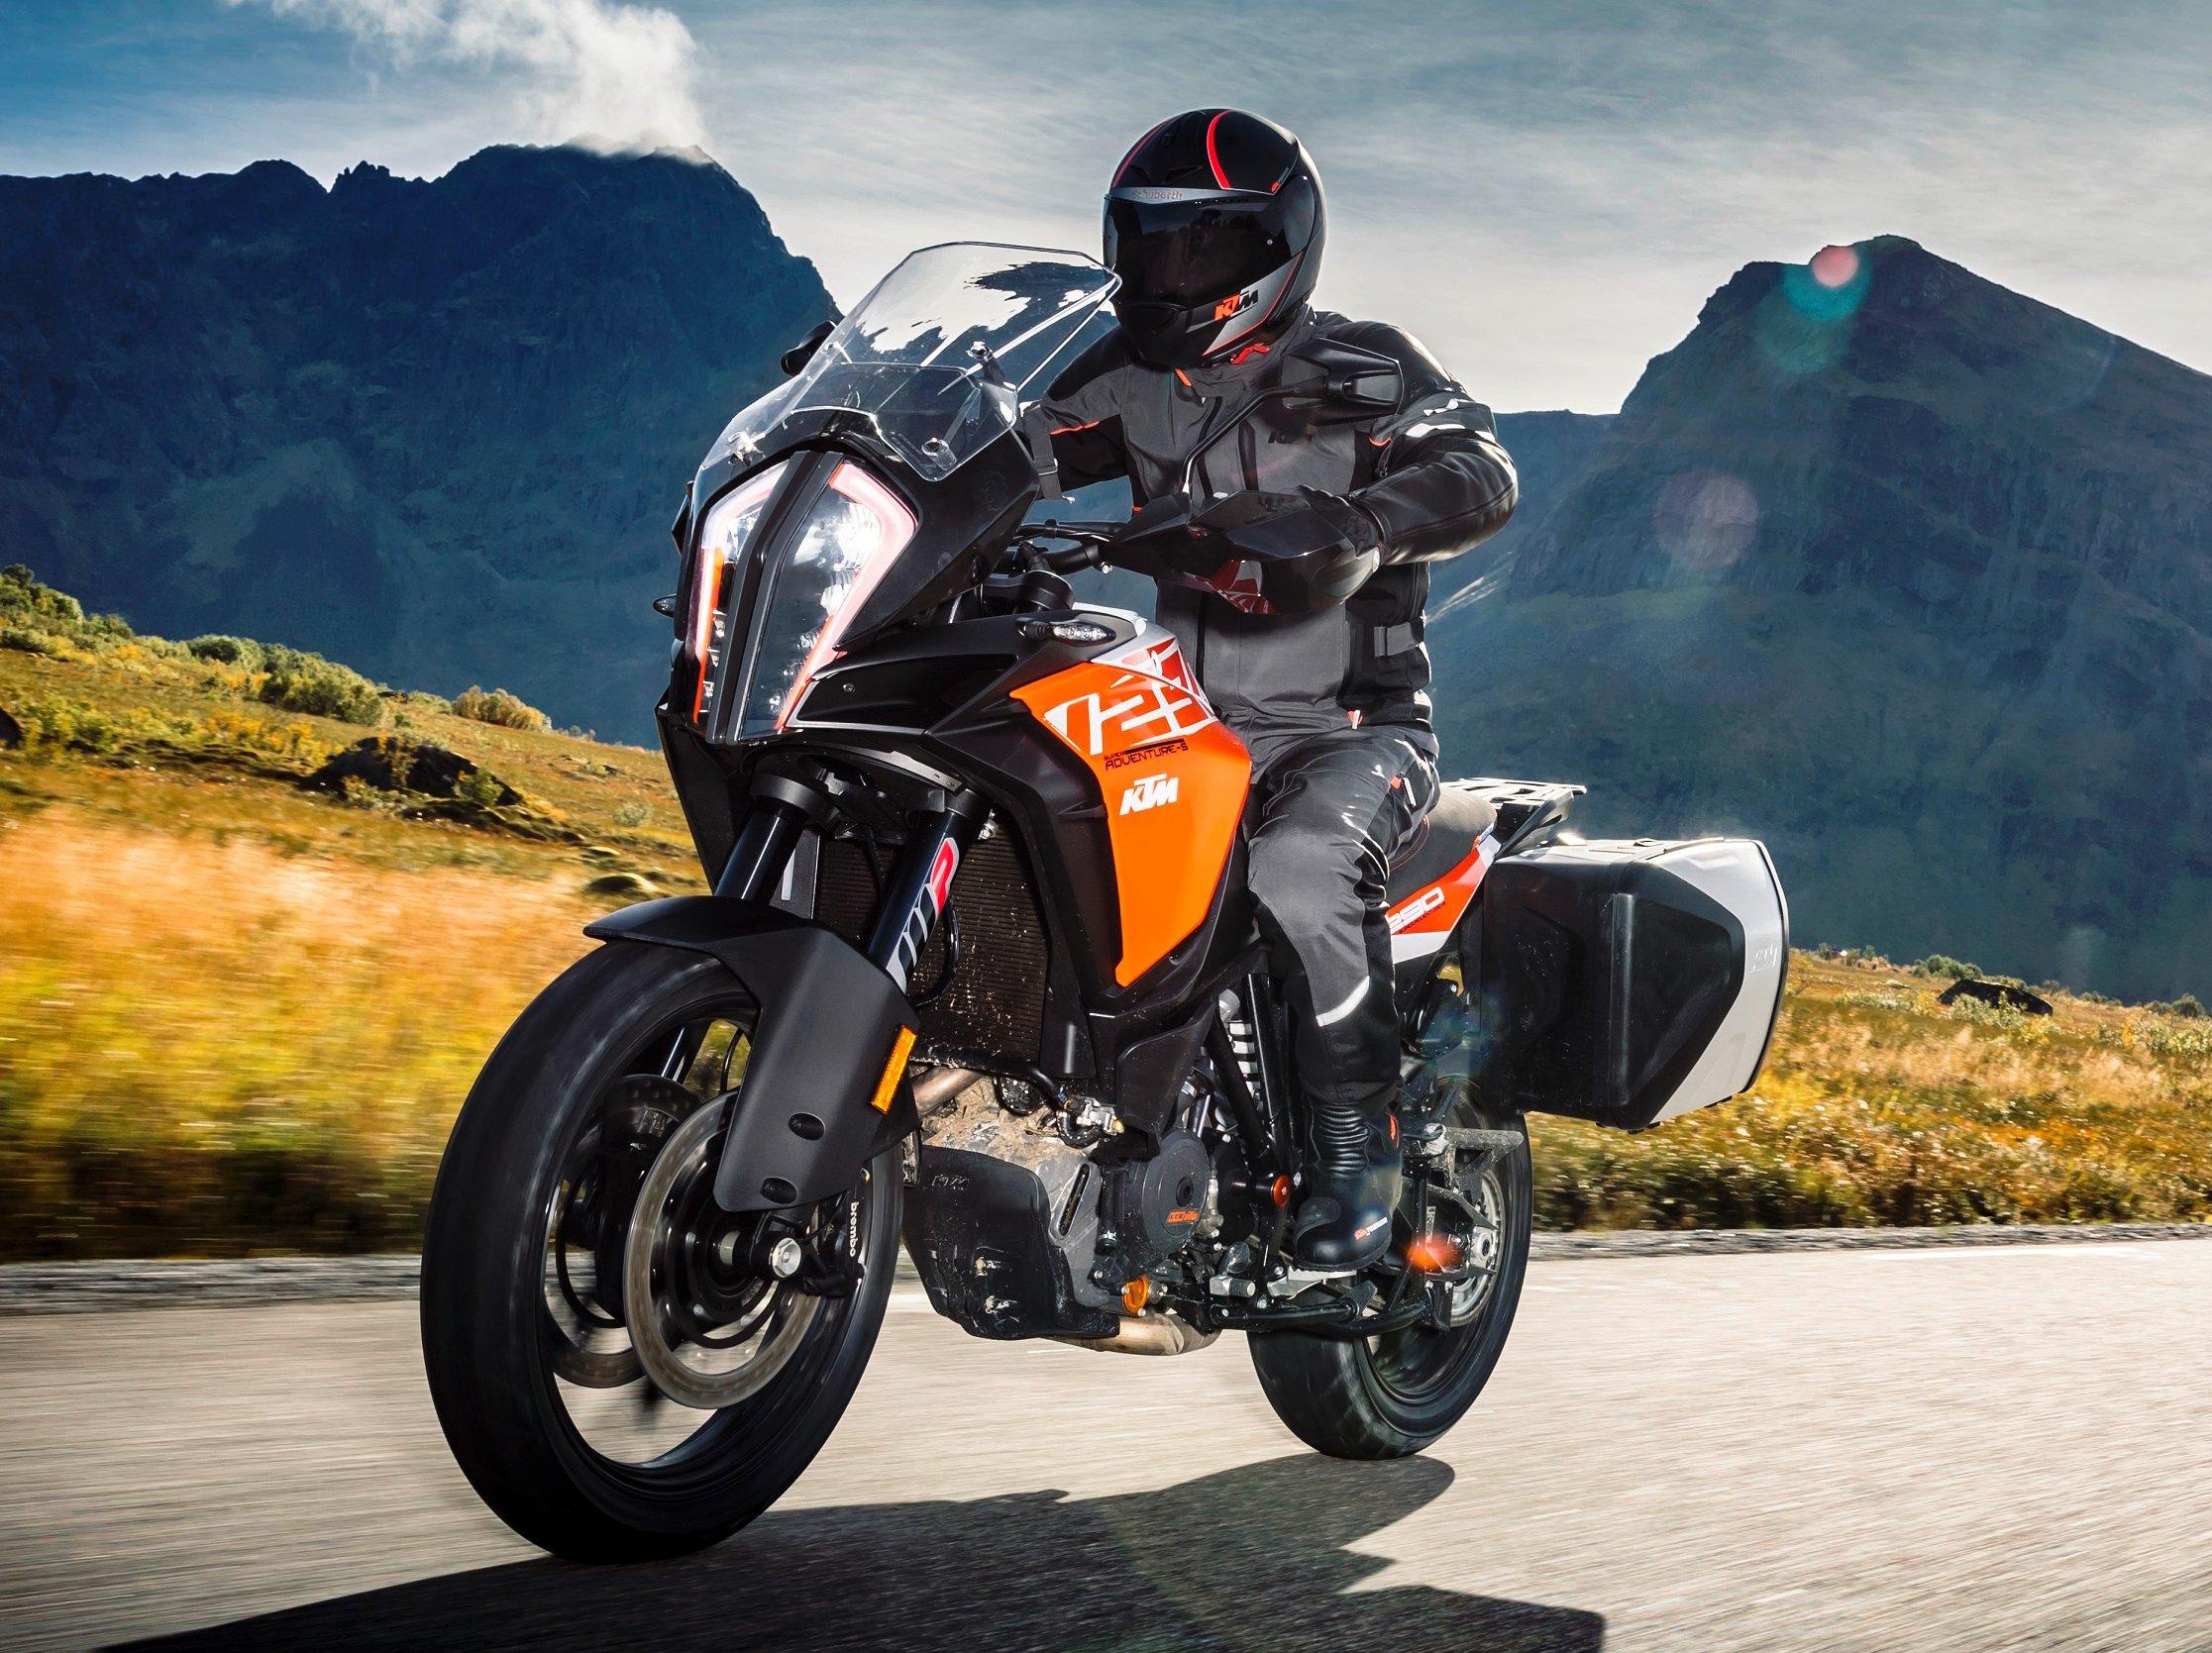 2017 ktm adventure motorcycle range revamped new 1090. Black Bedroom Furniture Sets. Home Design Ideas